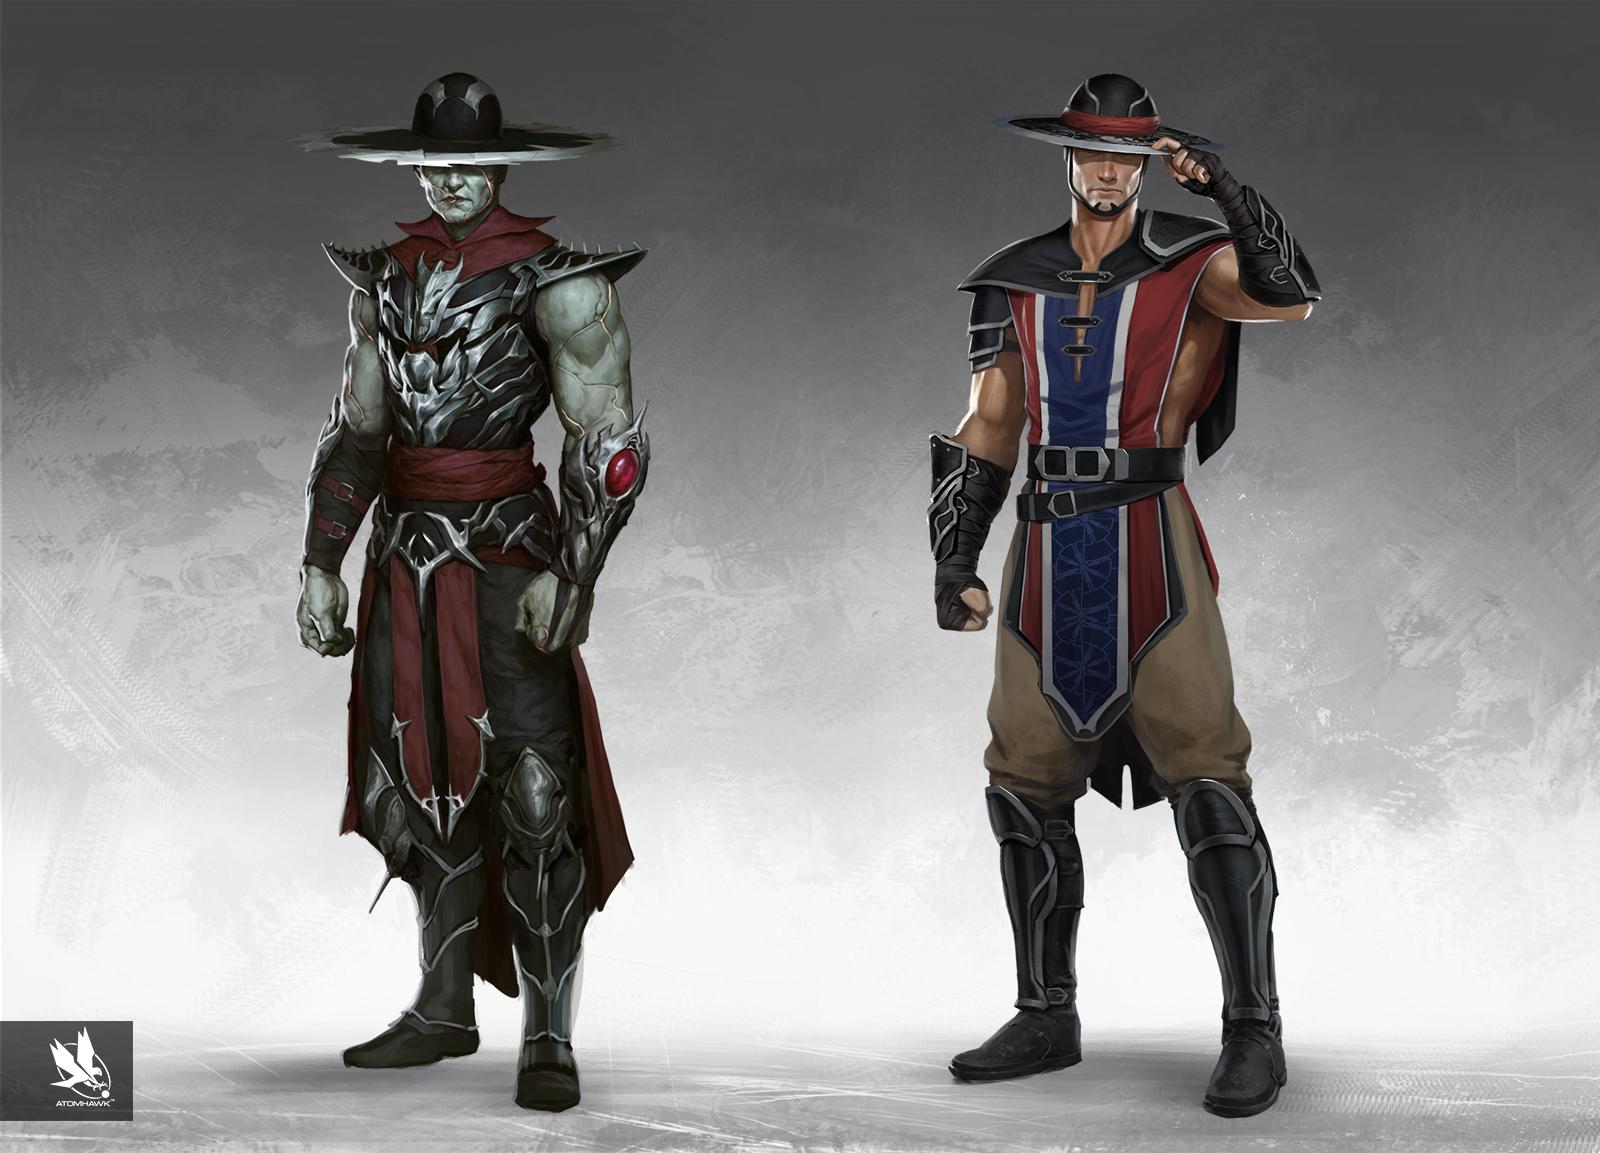 Atomhawk_Warner-Bros-NetherRealm_Mortal-Kombat-11_Concept-Art_Character-Design_Side-by-Side_Kung-Lao.jpg